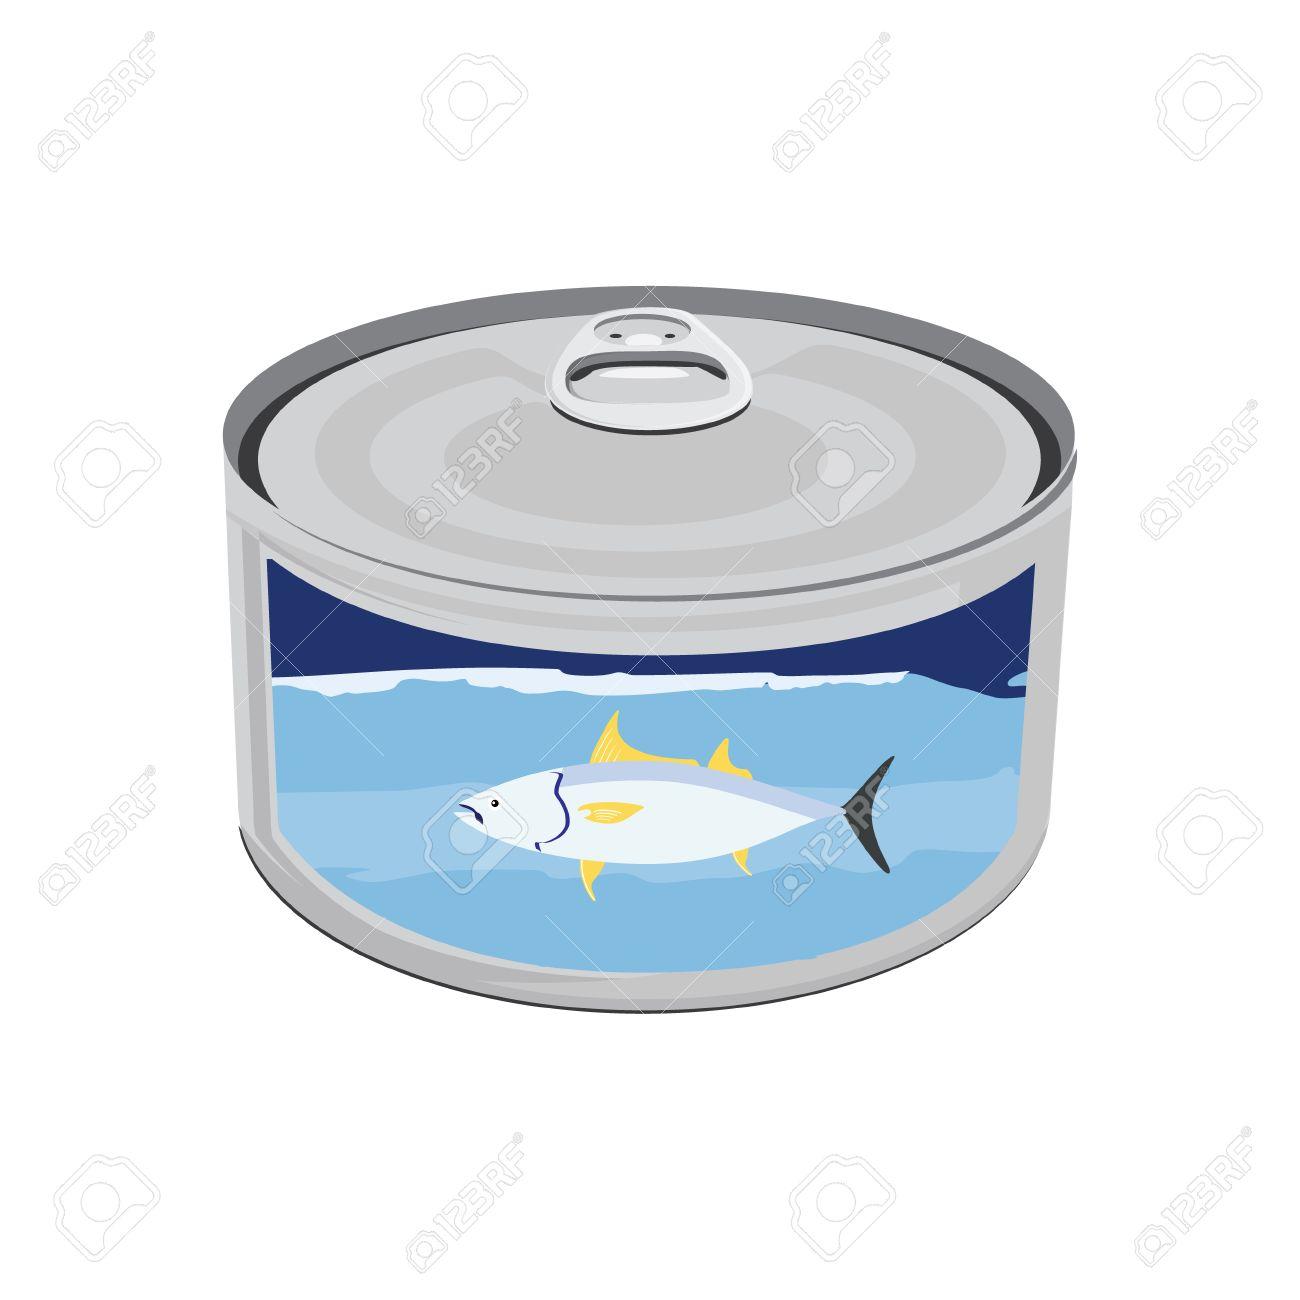 Vector illustration canned tuna fish icon. Can of tuna with label tuna fish. Flat design - 49946205